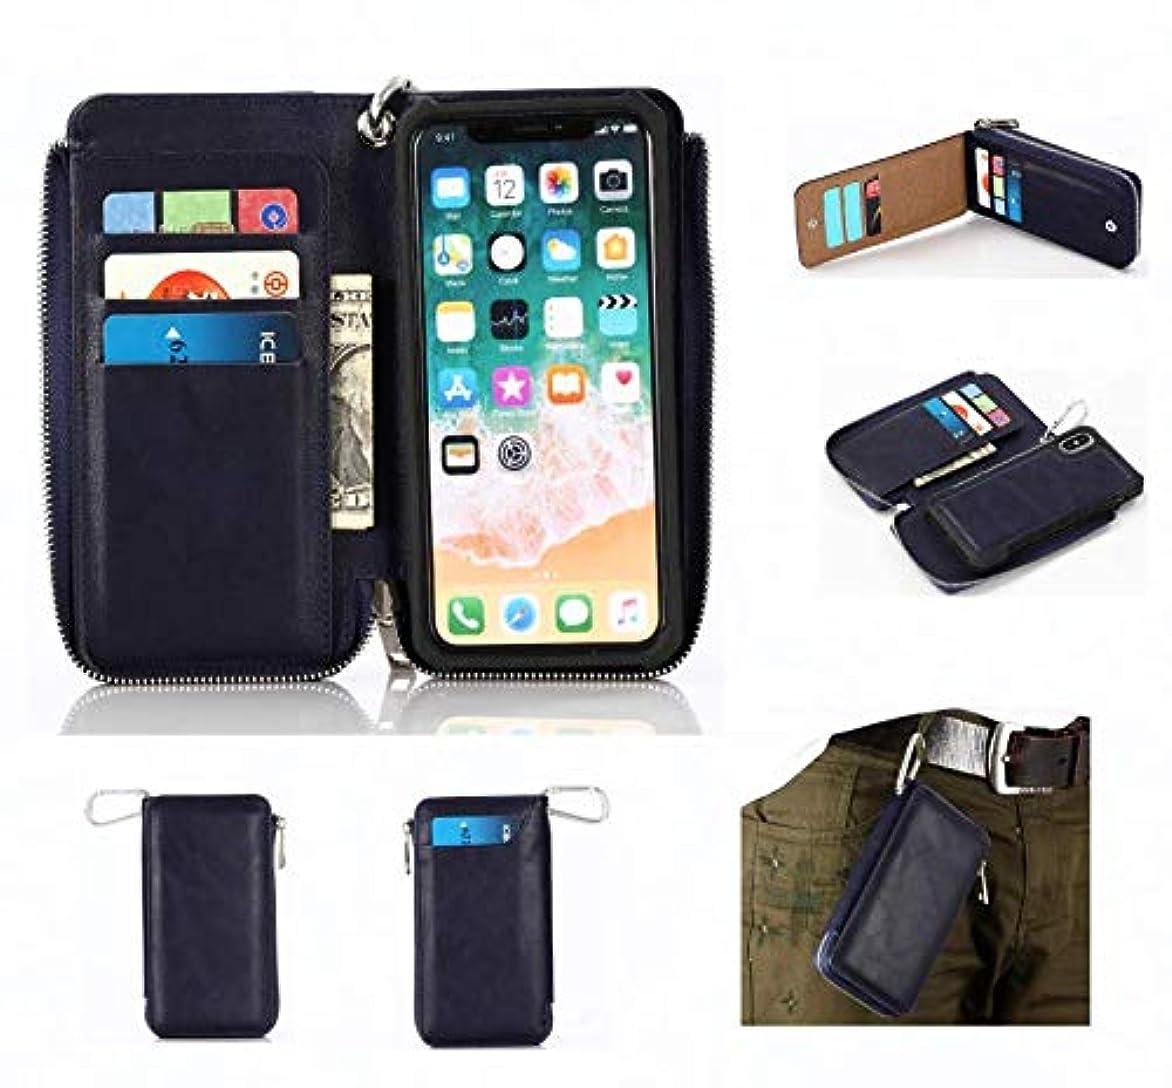 iPhone Xジッパー財布、iPhone XS携帯ポケット、メンズベルトベルトバッグ、金属リング、10個のカードスロット、キャッシュスロット、ボタンロックポケット、取り外し可能なスリムプロテクター、磁気カーラック